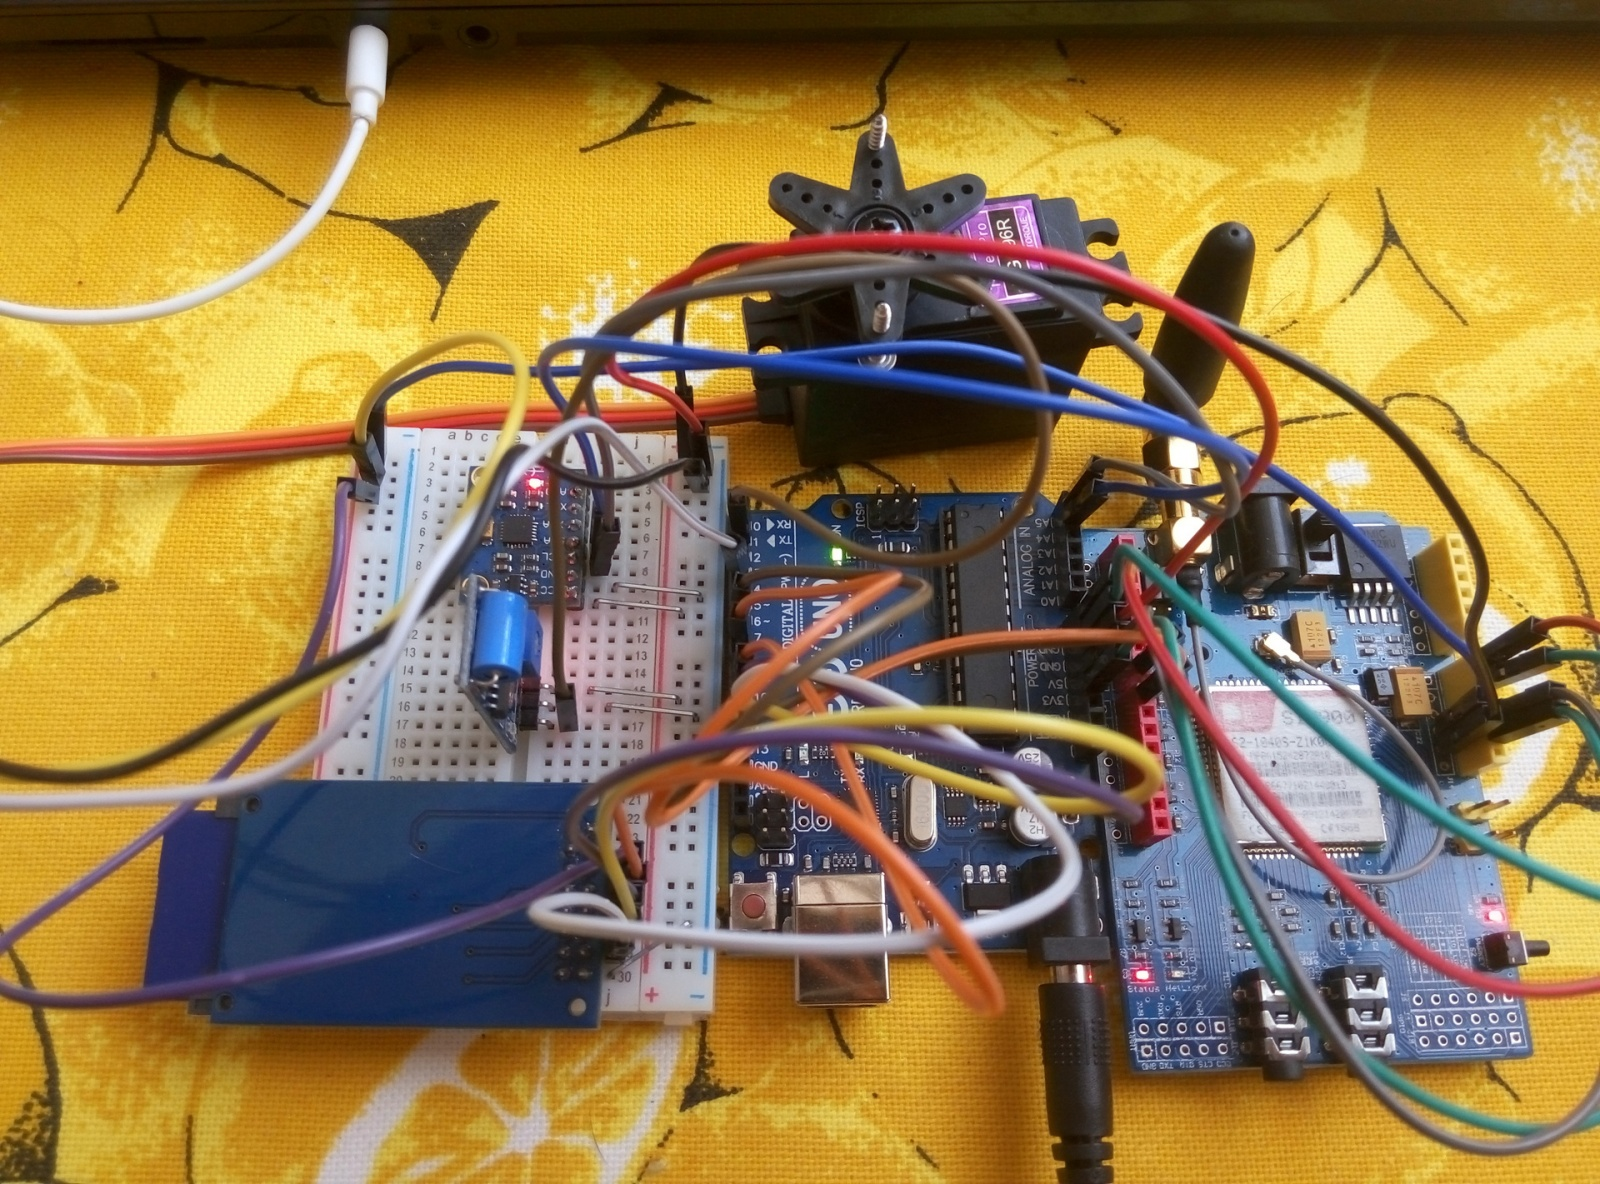 GSM-сигнализация для автомобиля на базе Arduino Uno - 13